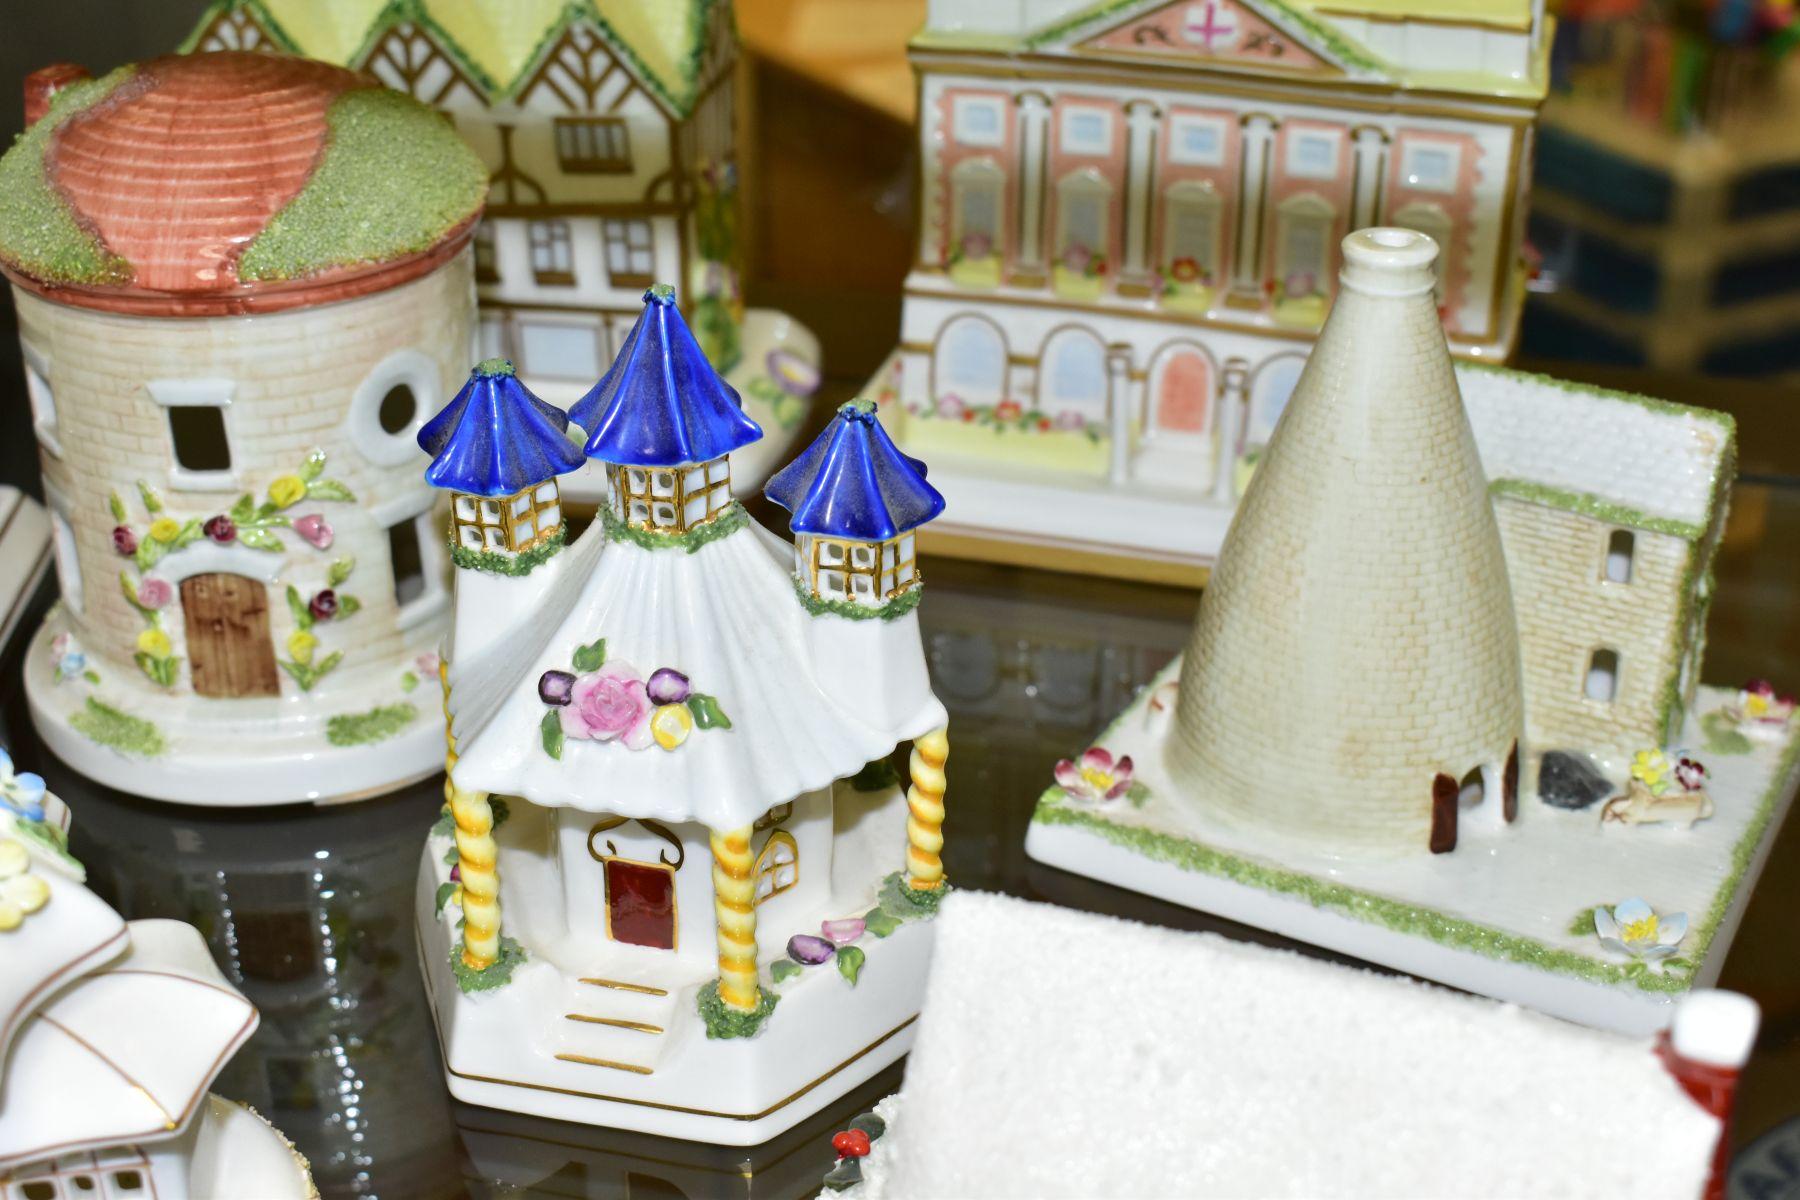 NINE COALPORT FINE BONE CHINA COTTAGES/BUILDINGS, comprising 'The Parasol House' (several flowers - Image 5 of 9